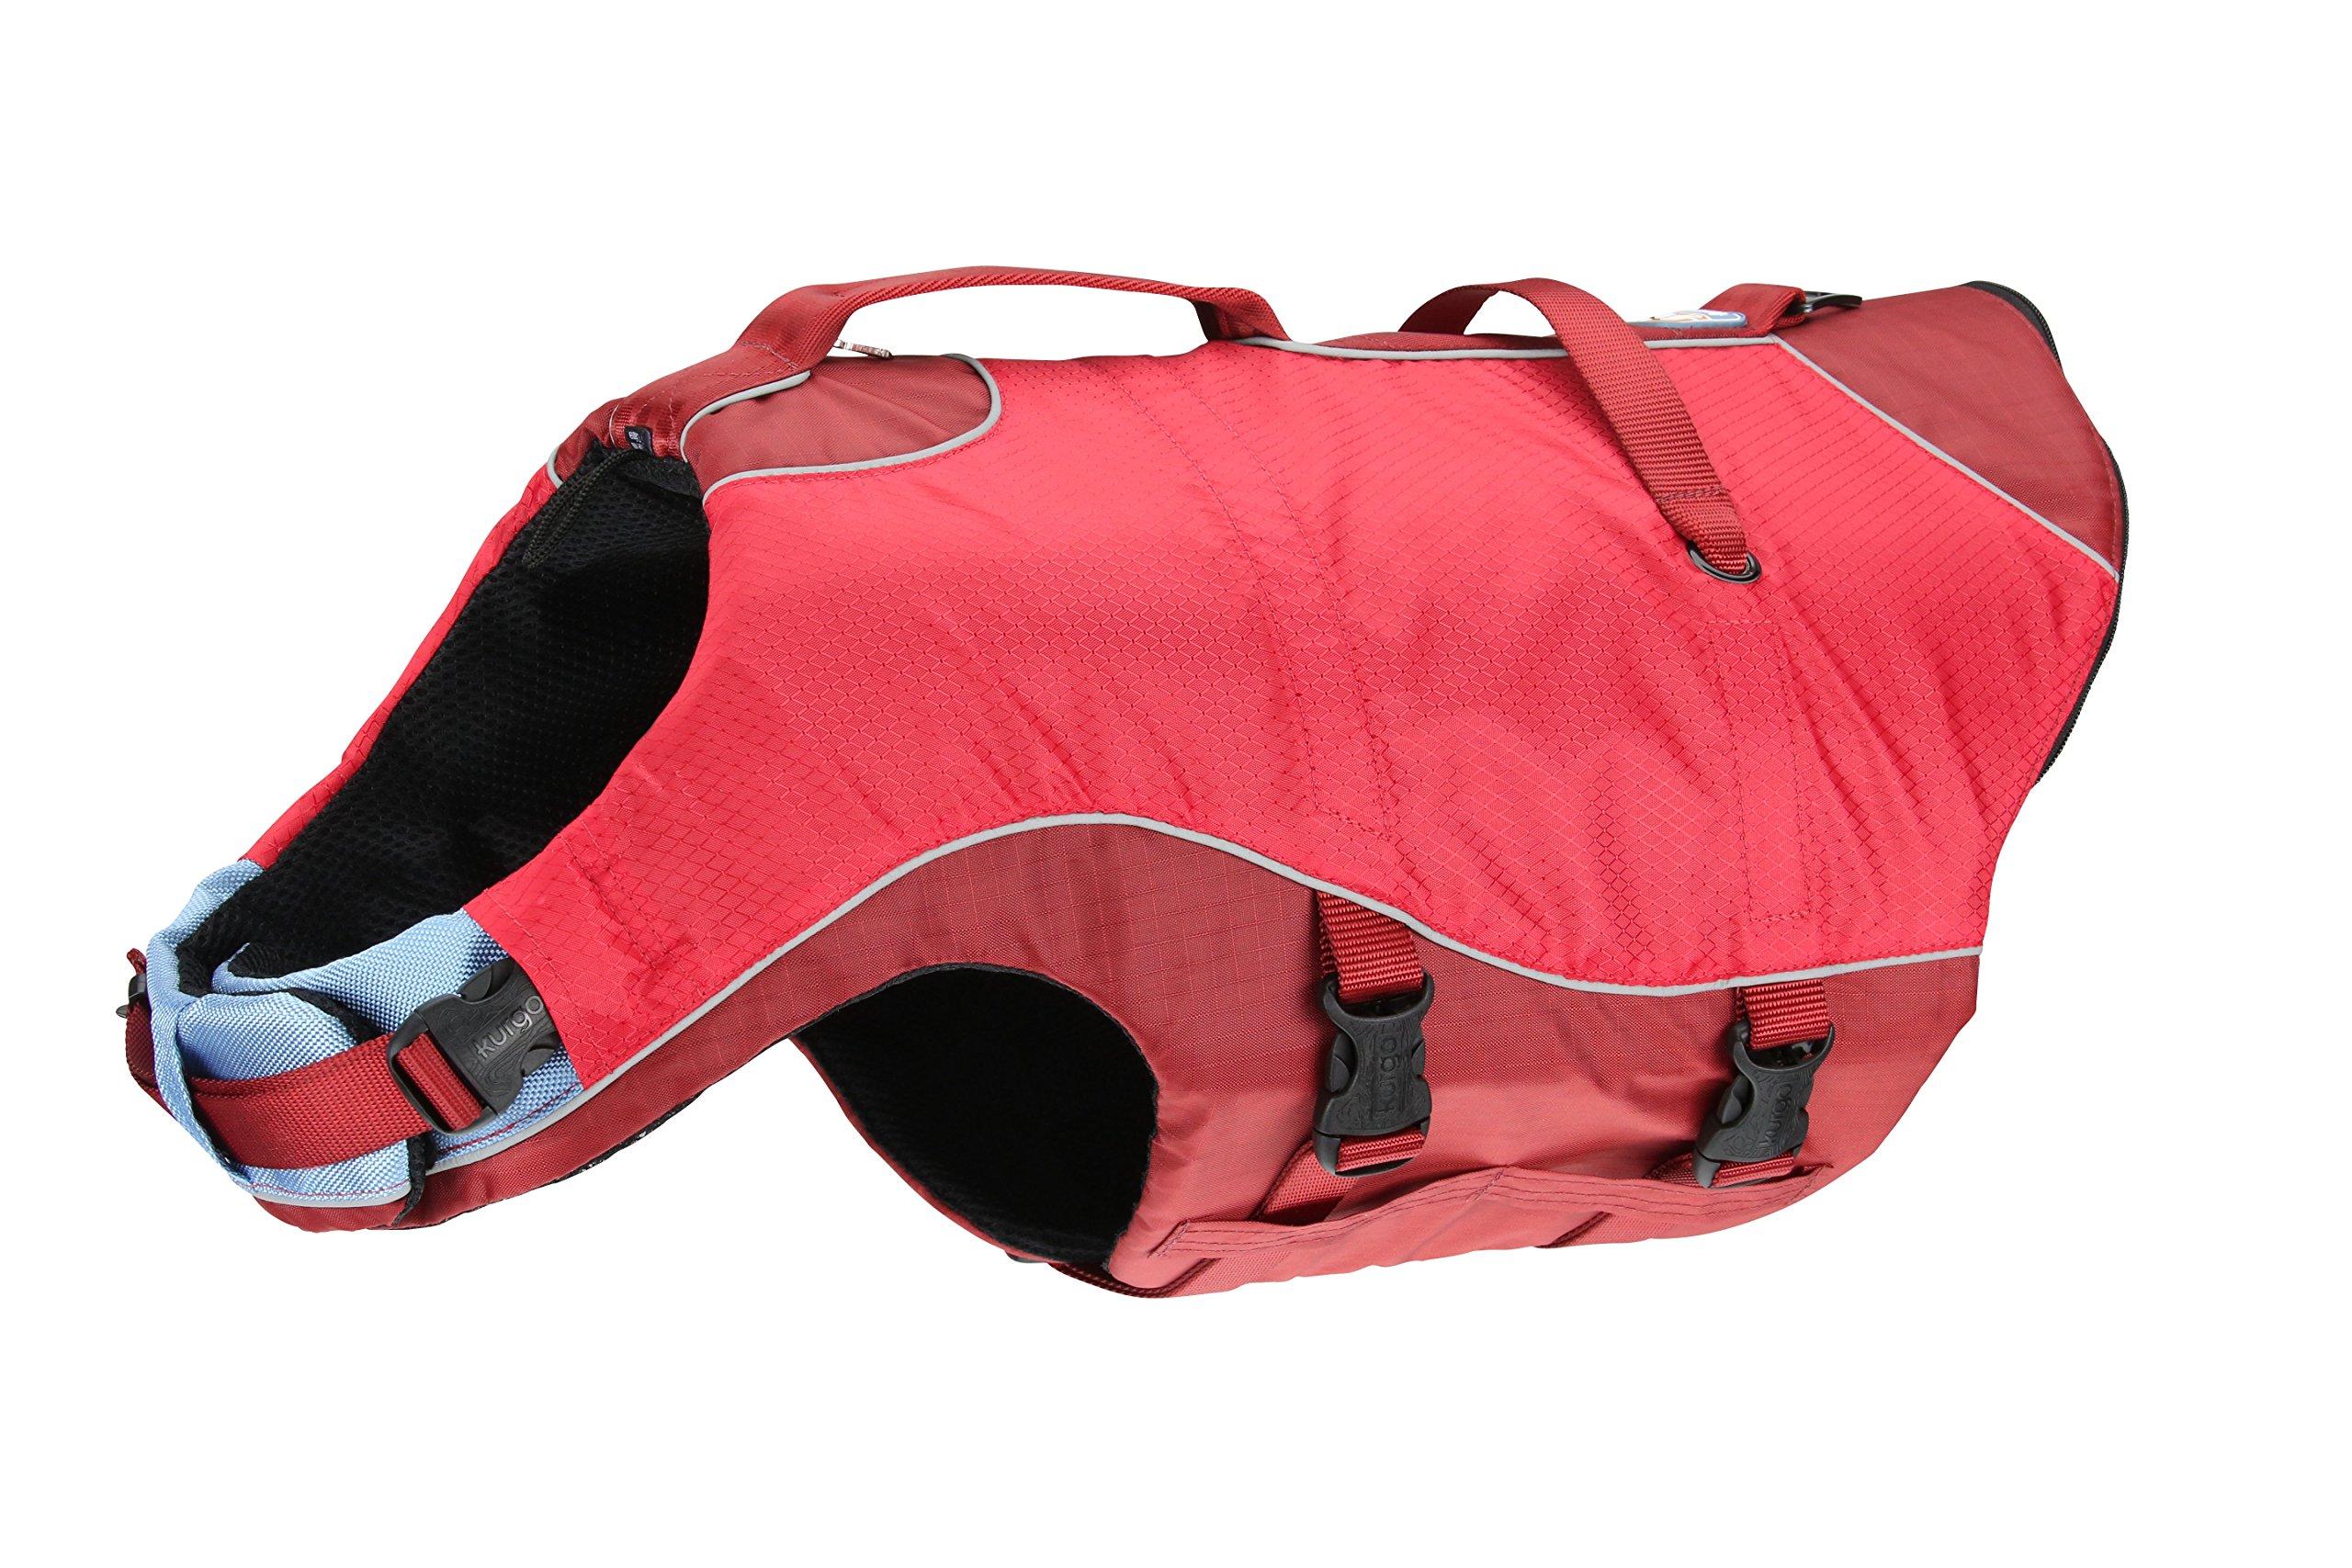 Kurgo Surf N Turf Dog Life Jacket - Adjustable with Reflective Trim, X-Small, Red